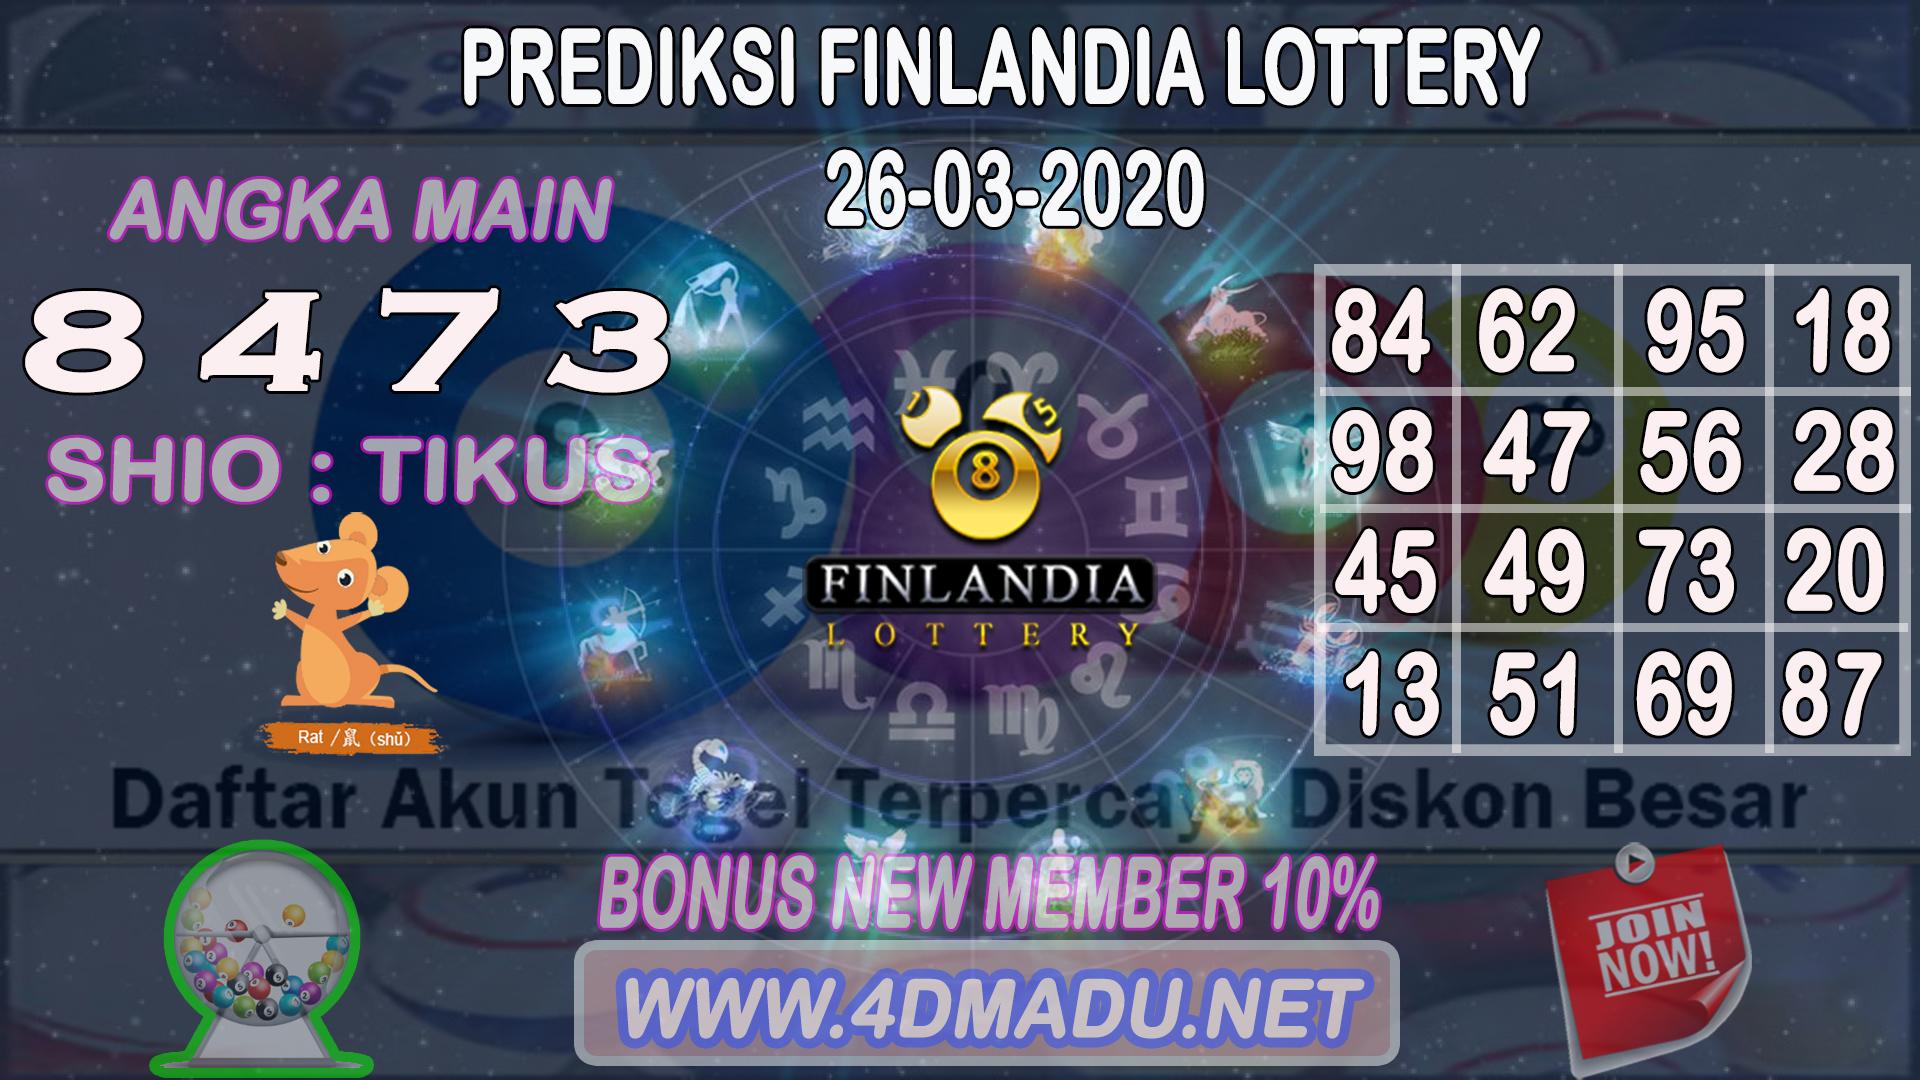 PREDIKSI FINLANDIA LOTTERY 26 MARET 2020